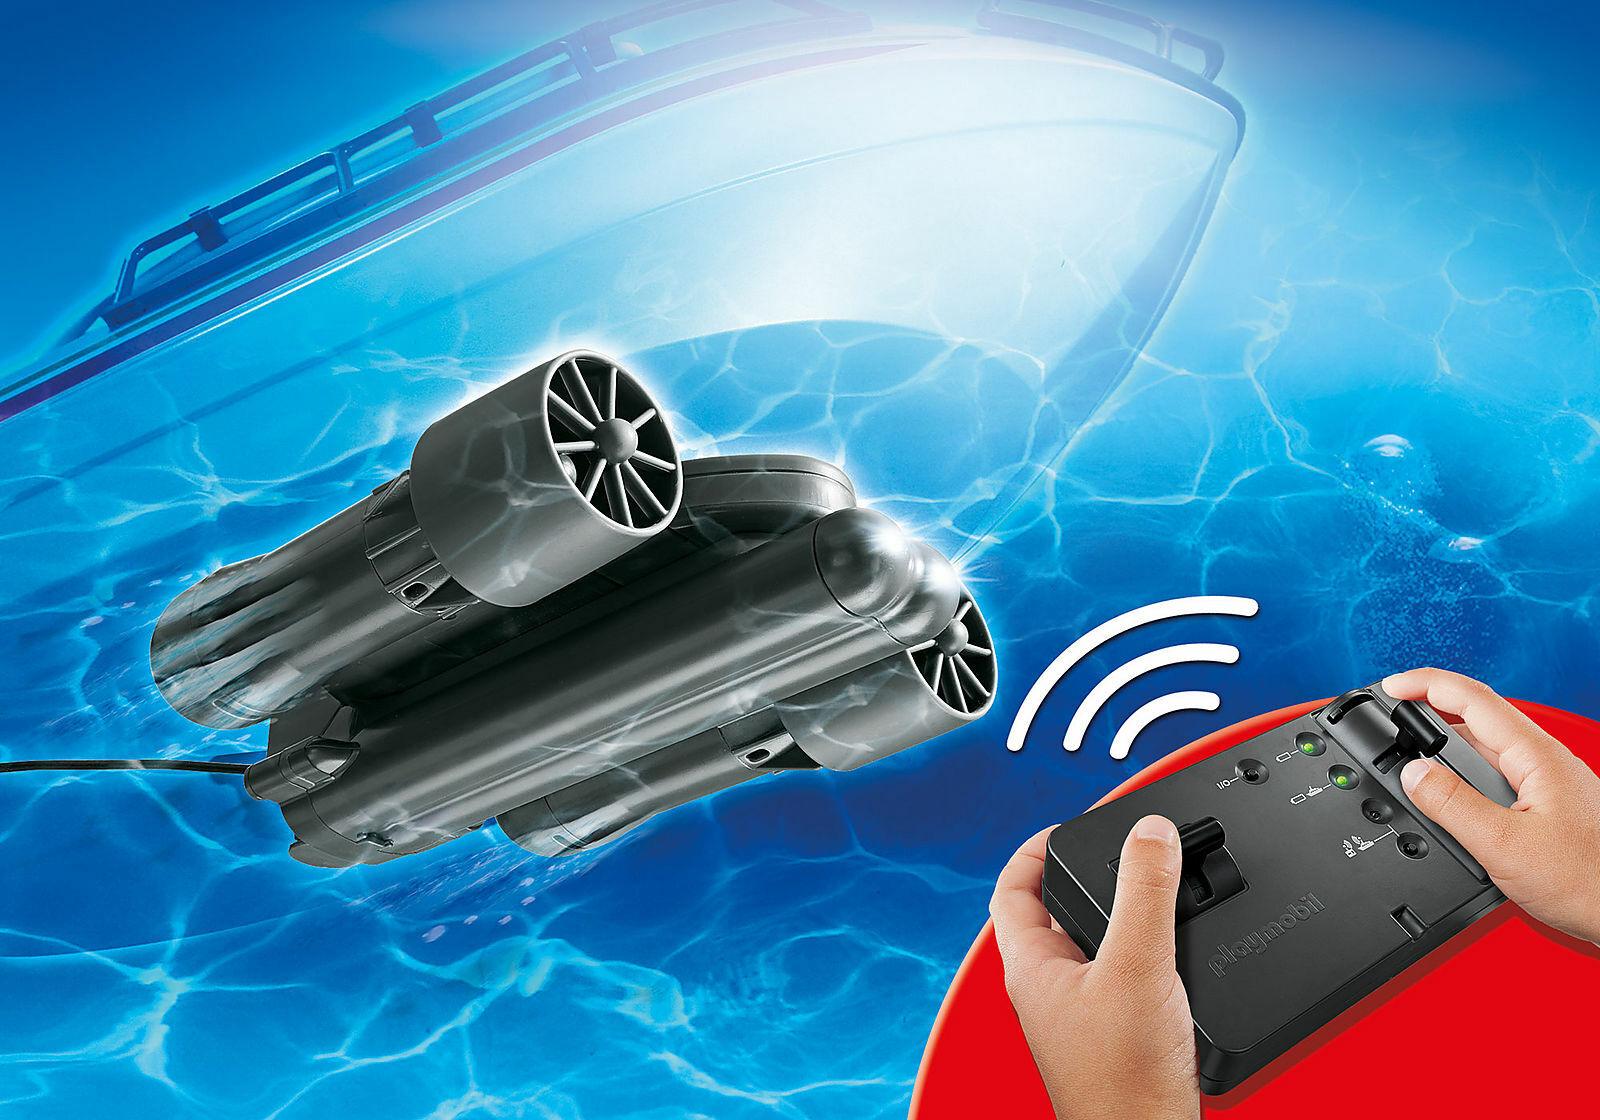 Playmobil - 9853 - RC-Unterwassermotor - NEU OVP